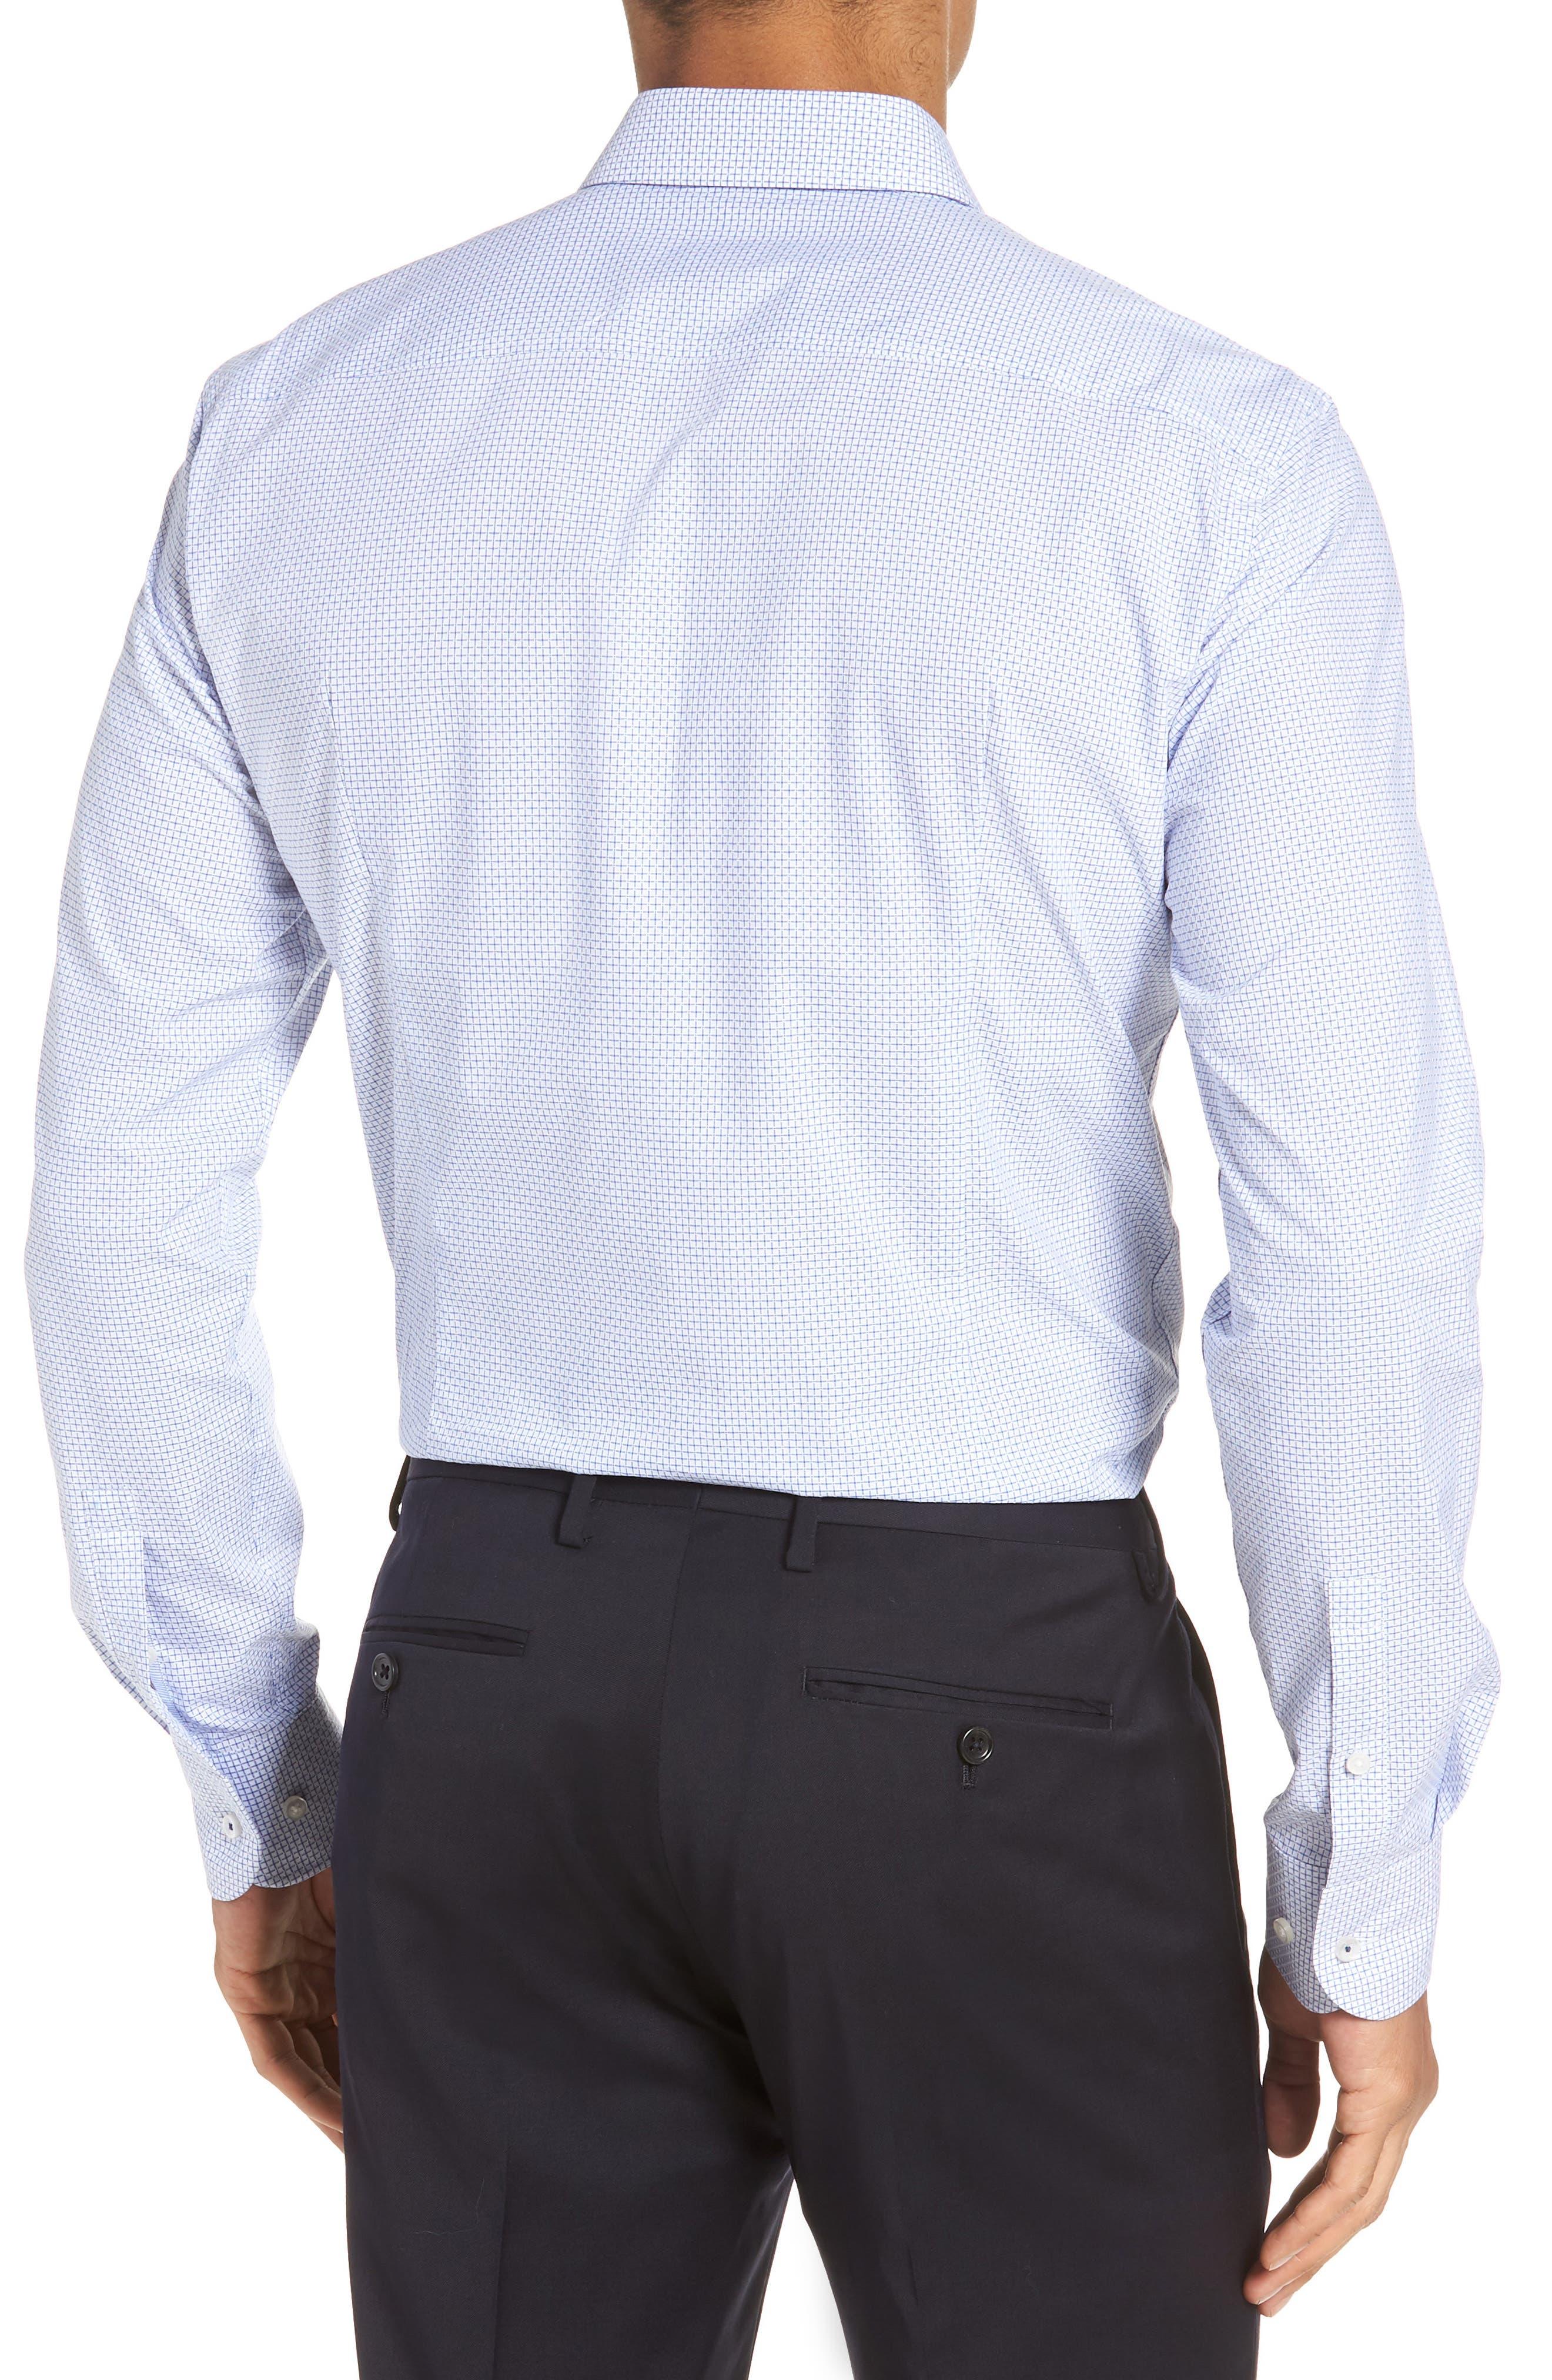 Jesse Slim Fit Check Dress Shirt,                             Alternate thumbnail 3, color,                             431